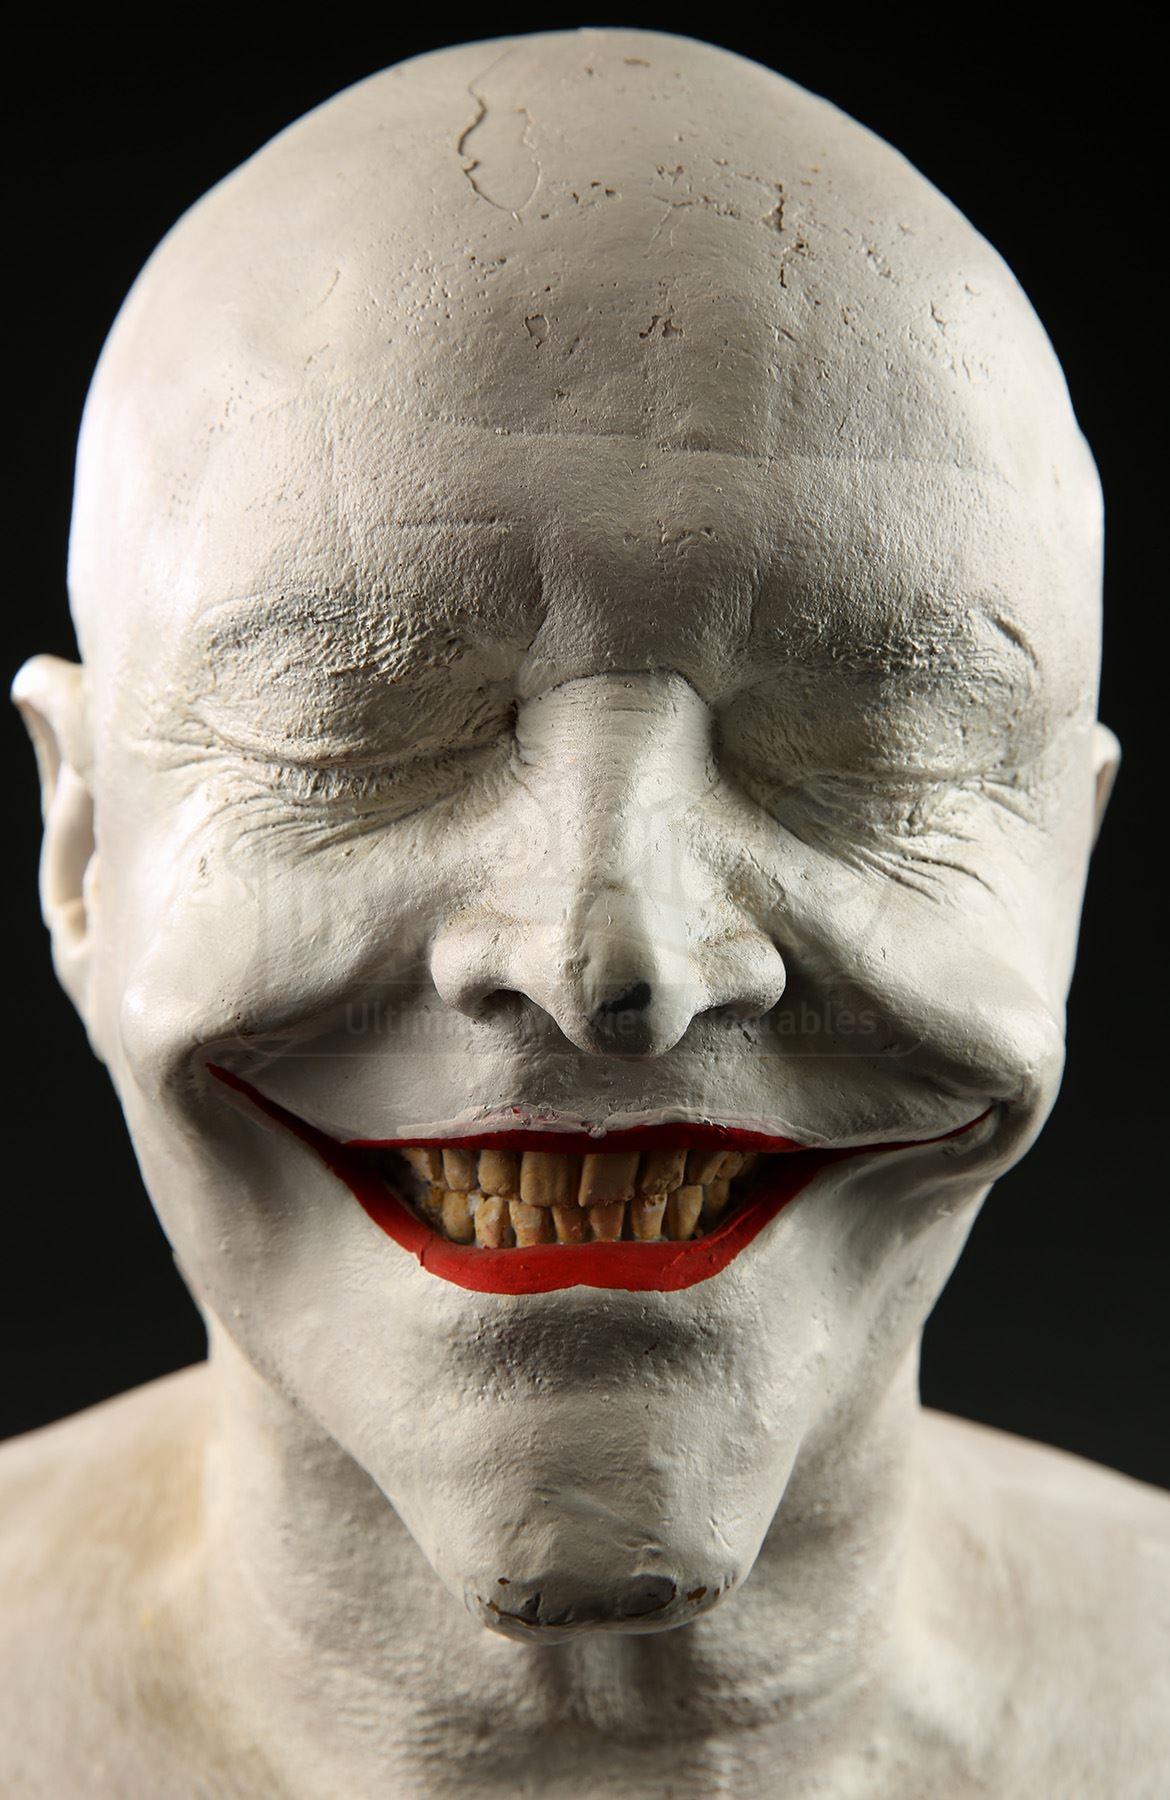 The Joker Jack Nicholson No Makeup Makeup Nuovogennarino - Joker-no-makeup-ics